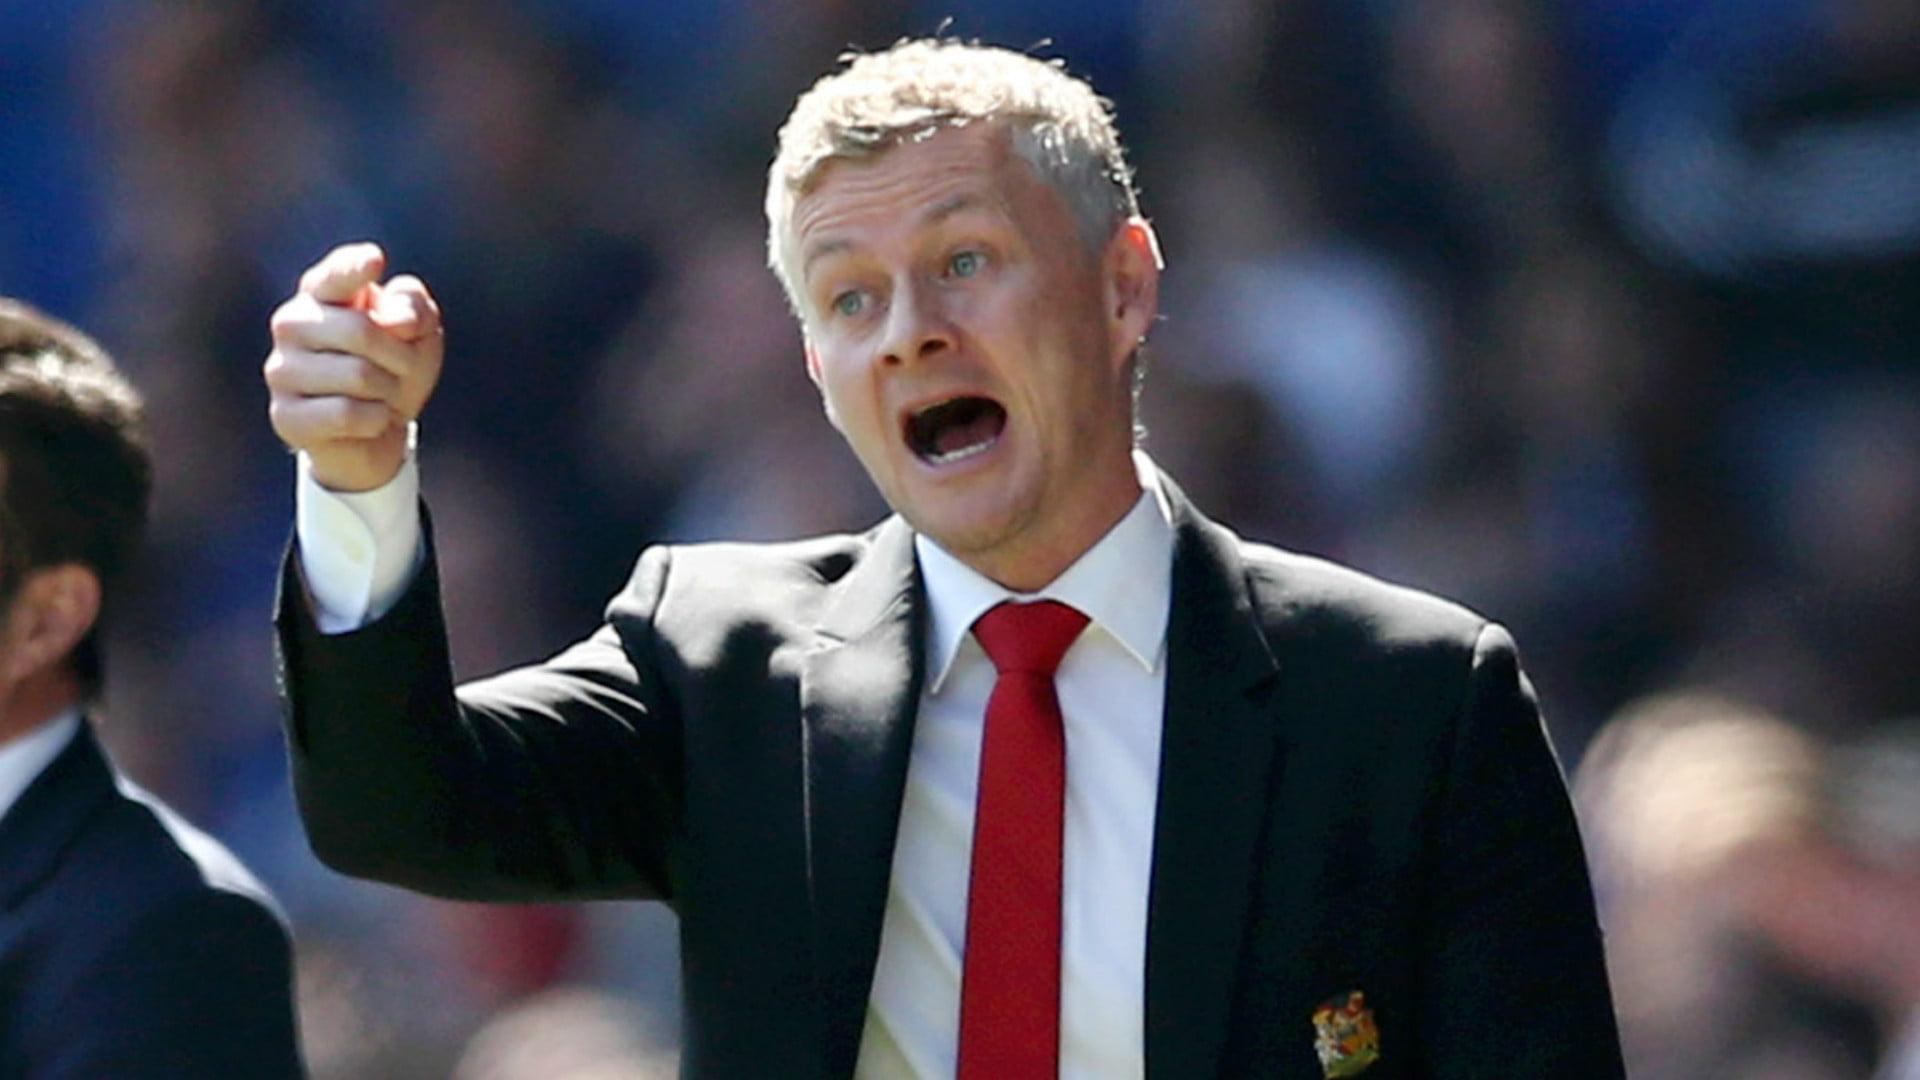 ole gunnar solskjaer manchester united 2018 19 423j6oosovwi16wcj5cmjlcez - Solskjaer issues strong warning to Man Utd players ahead of preseason